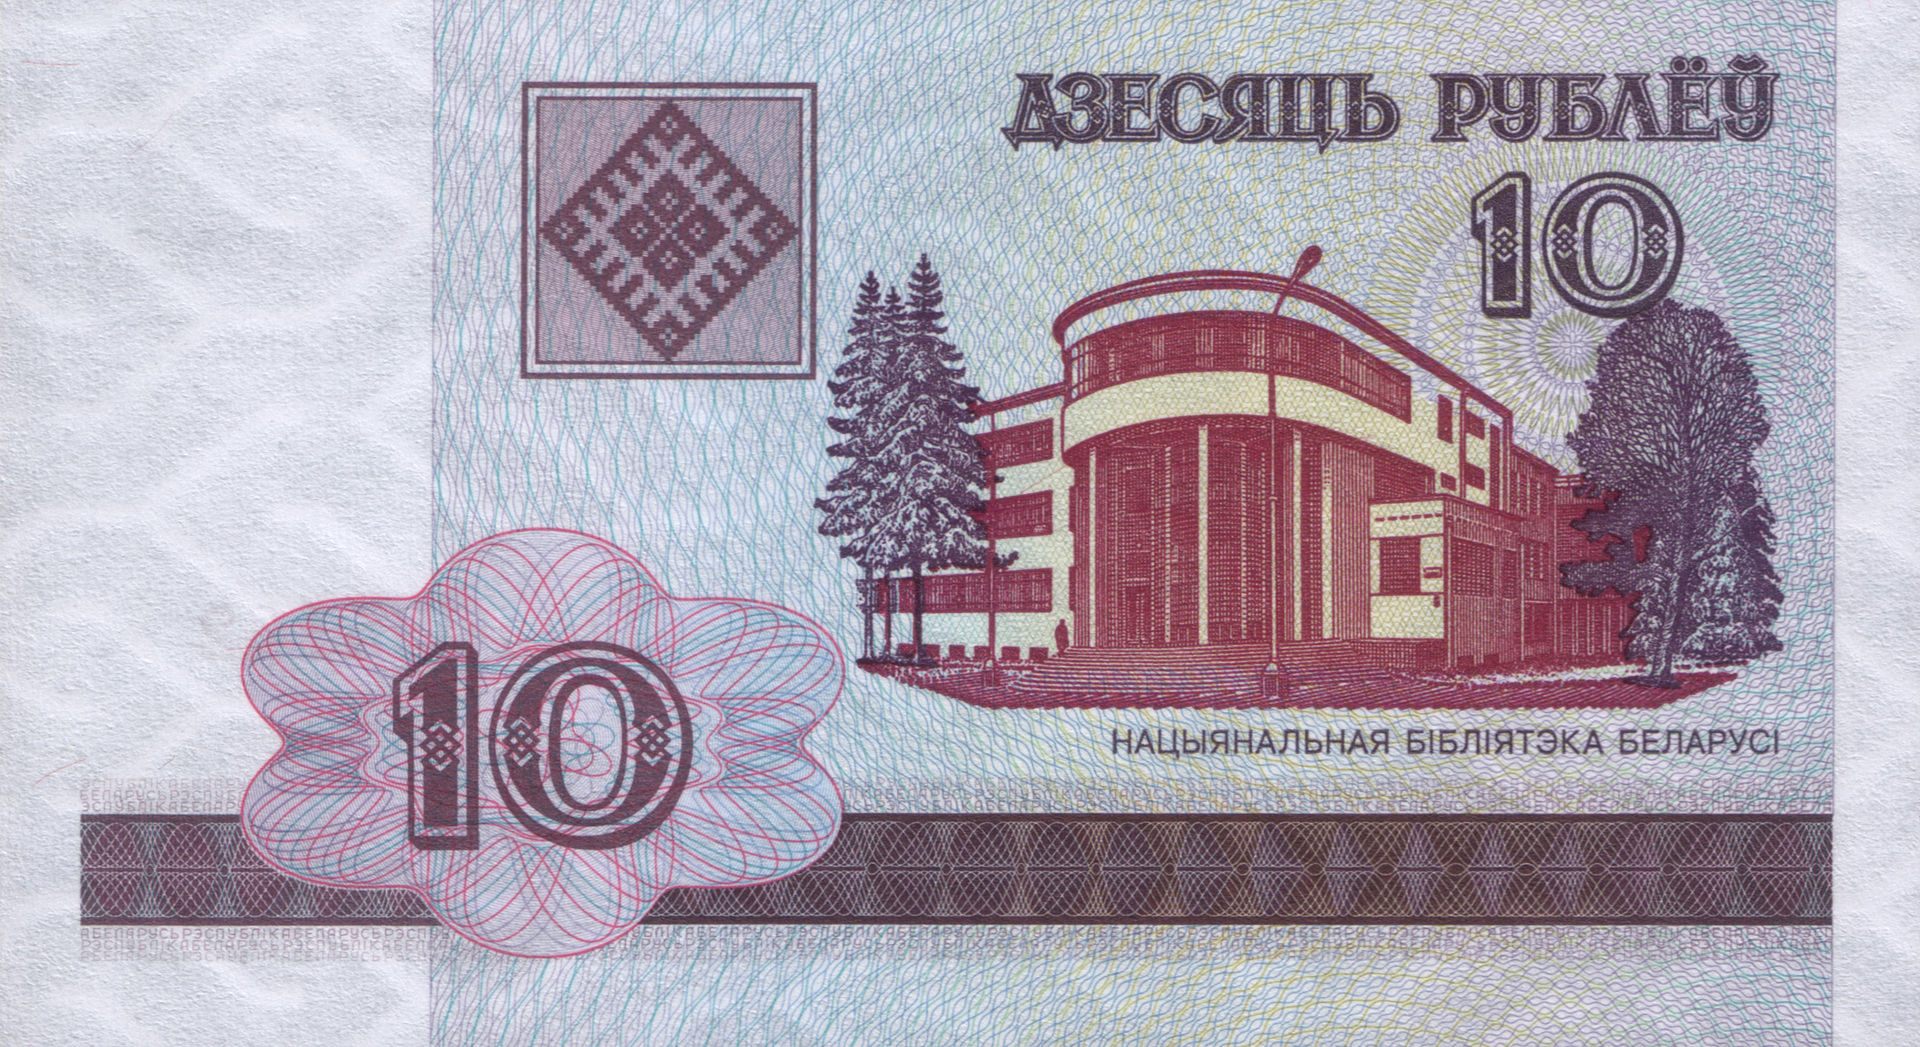 Belarus-2000-Bill-10-Obverse.jpg